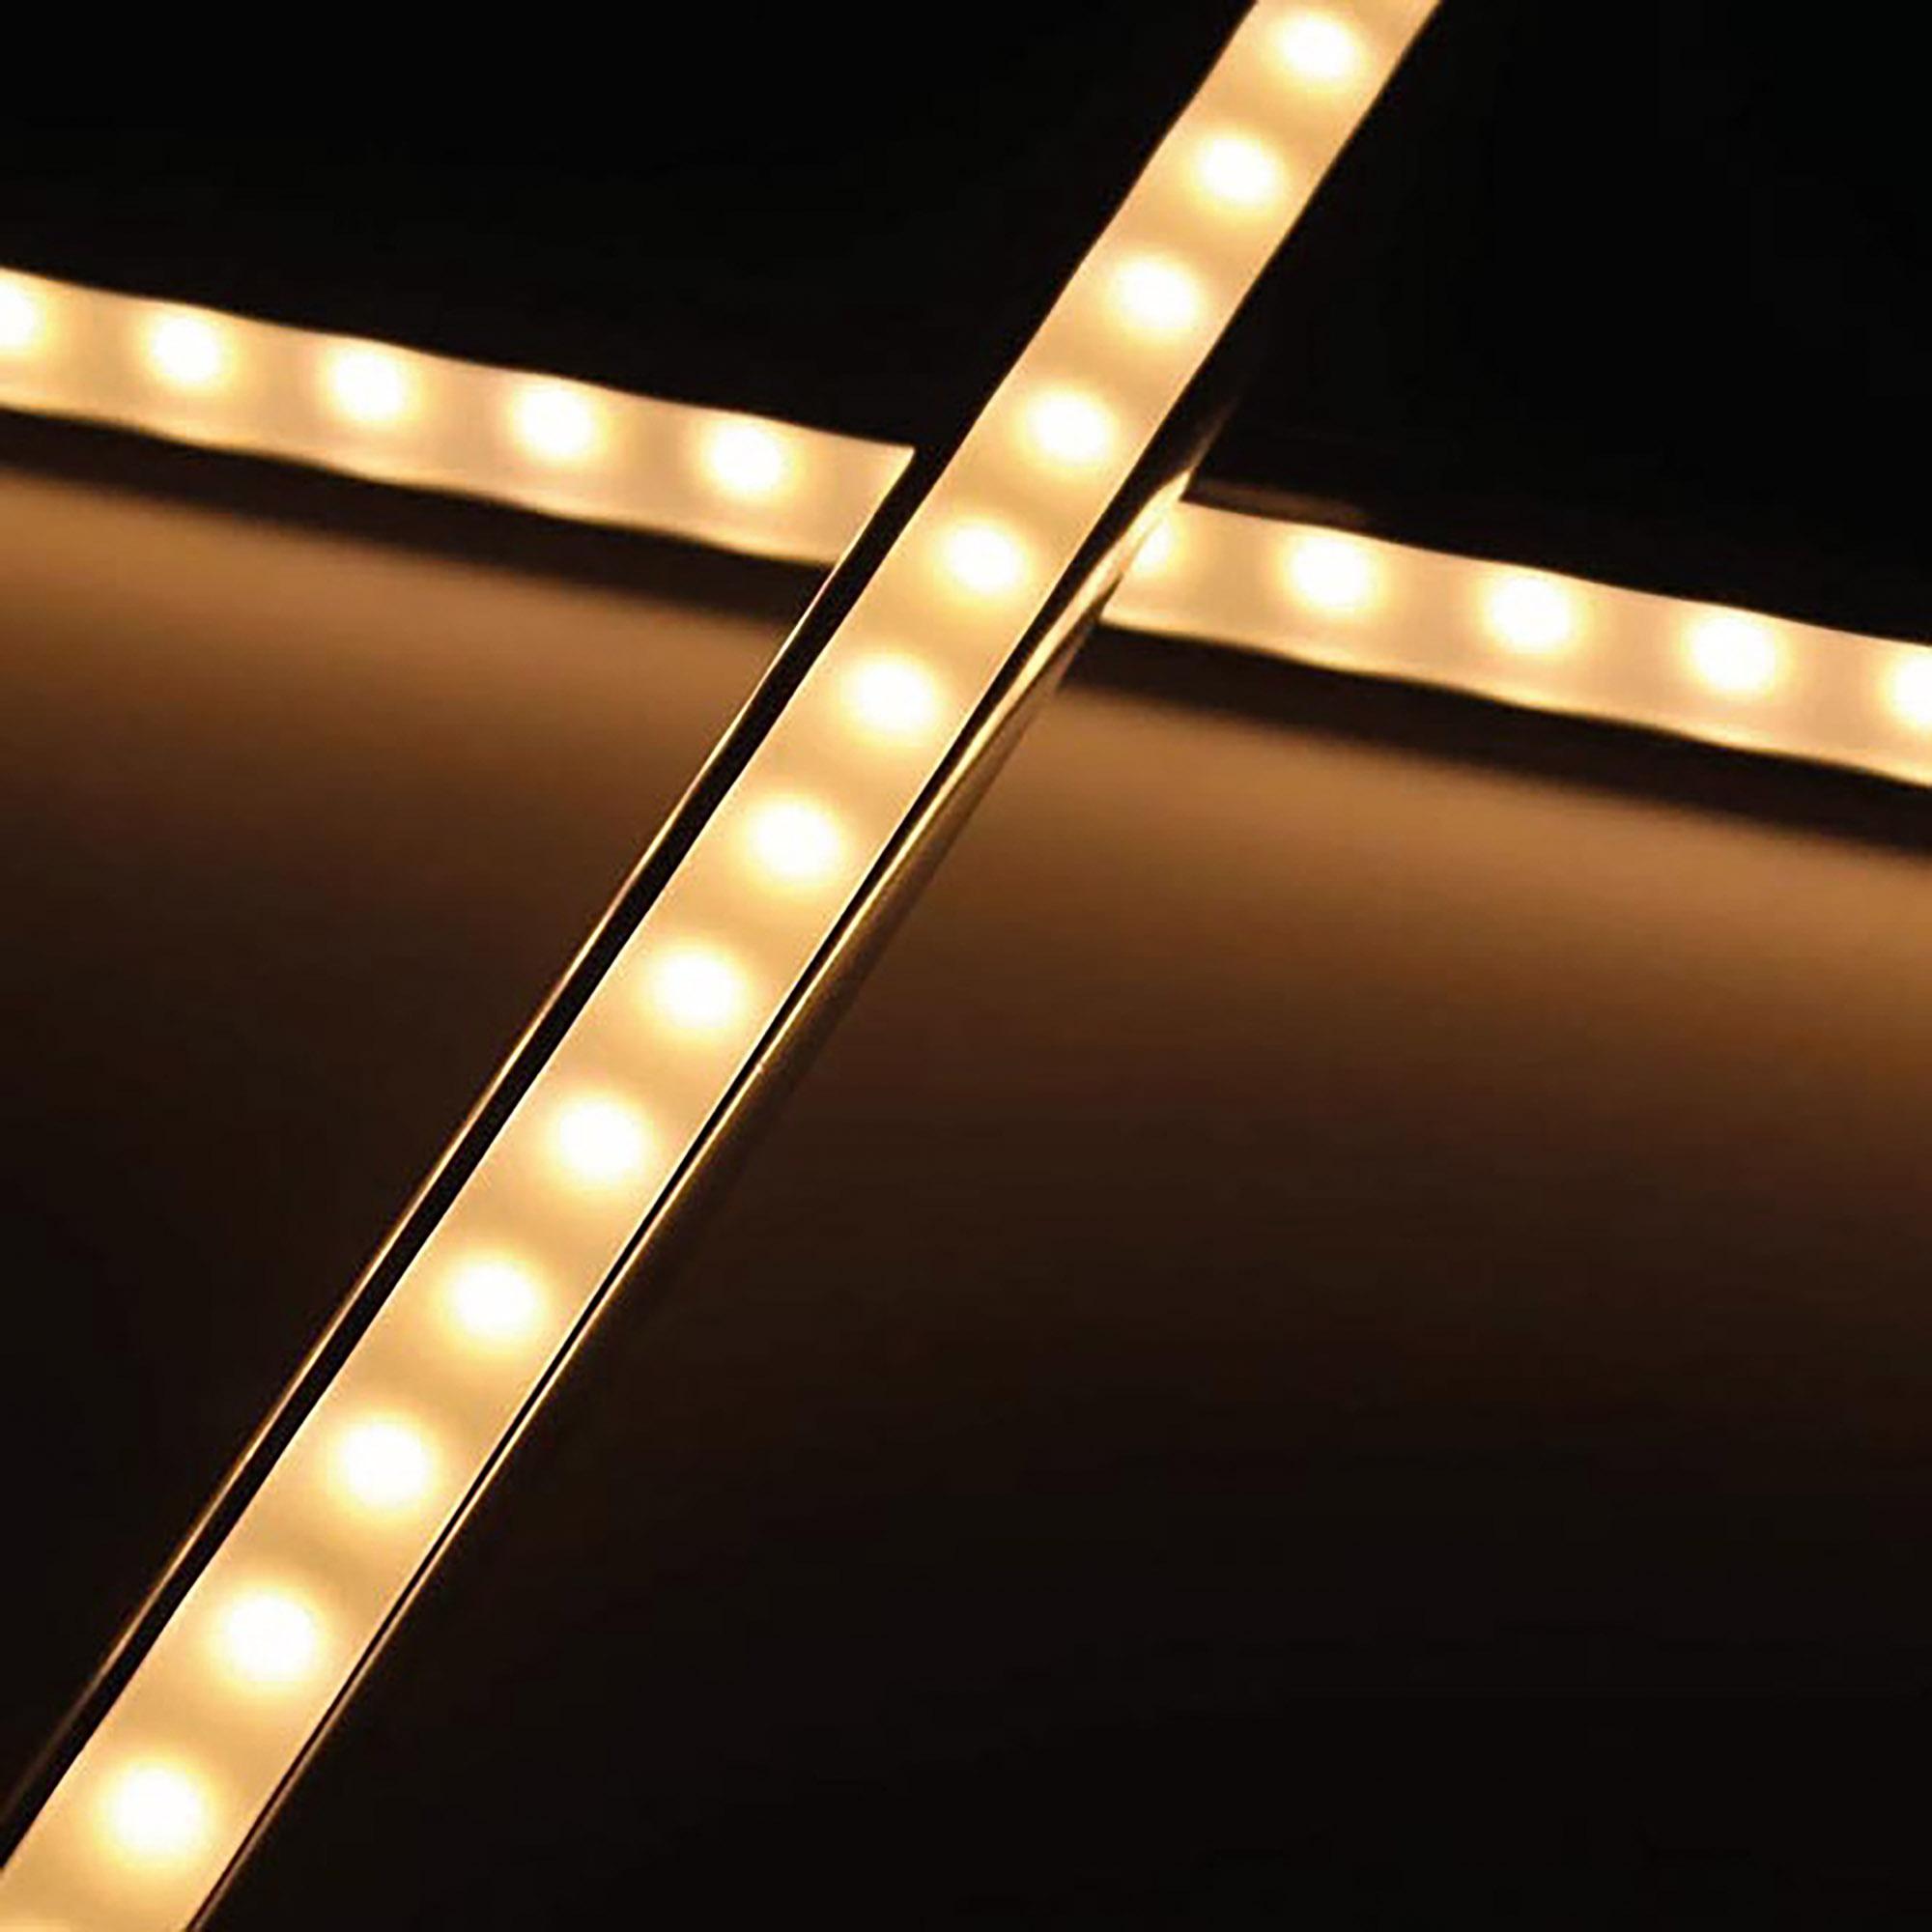 sp1_high-power-led-lichtleiste-diffus-warmweiss-24v-3000 x 3000-LR-Louis.jpg